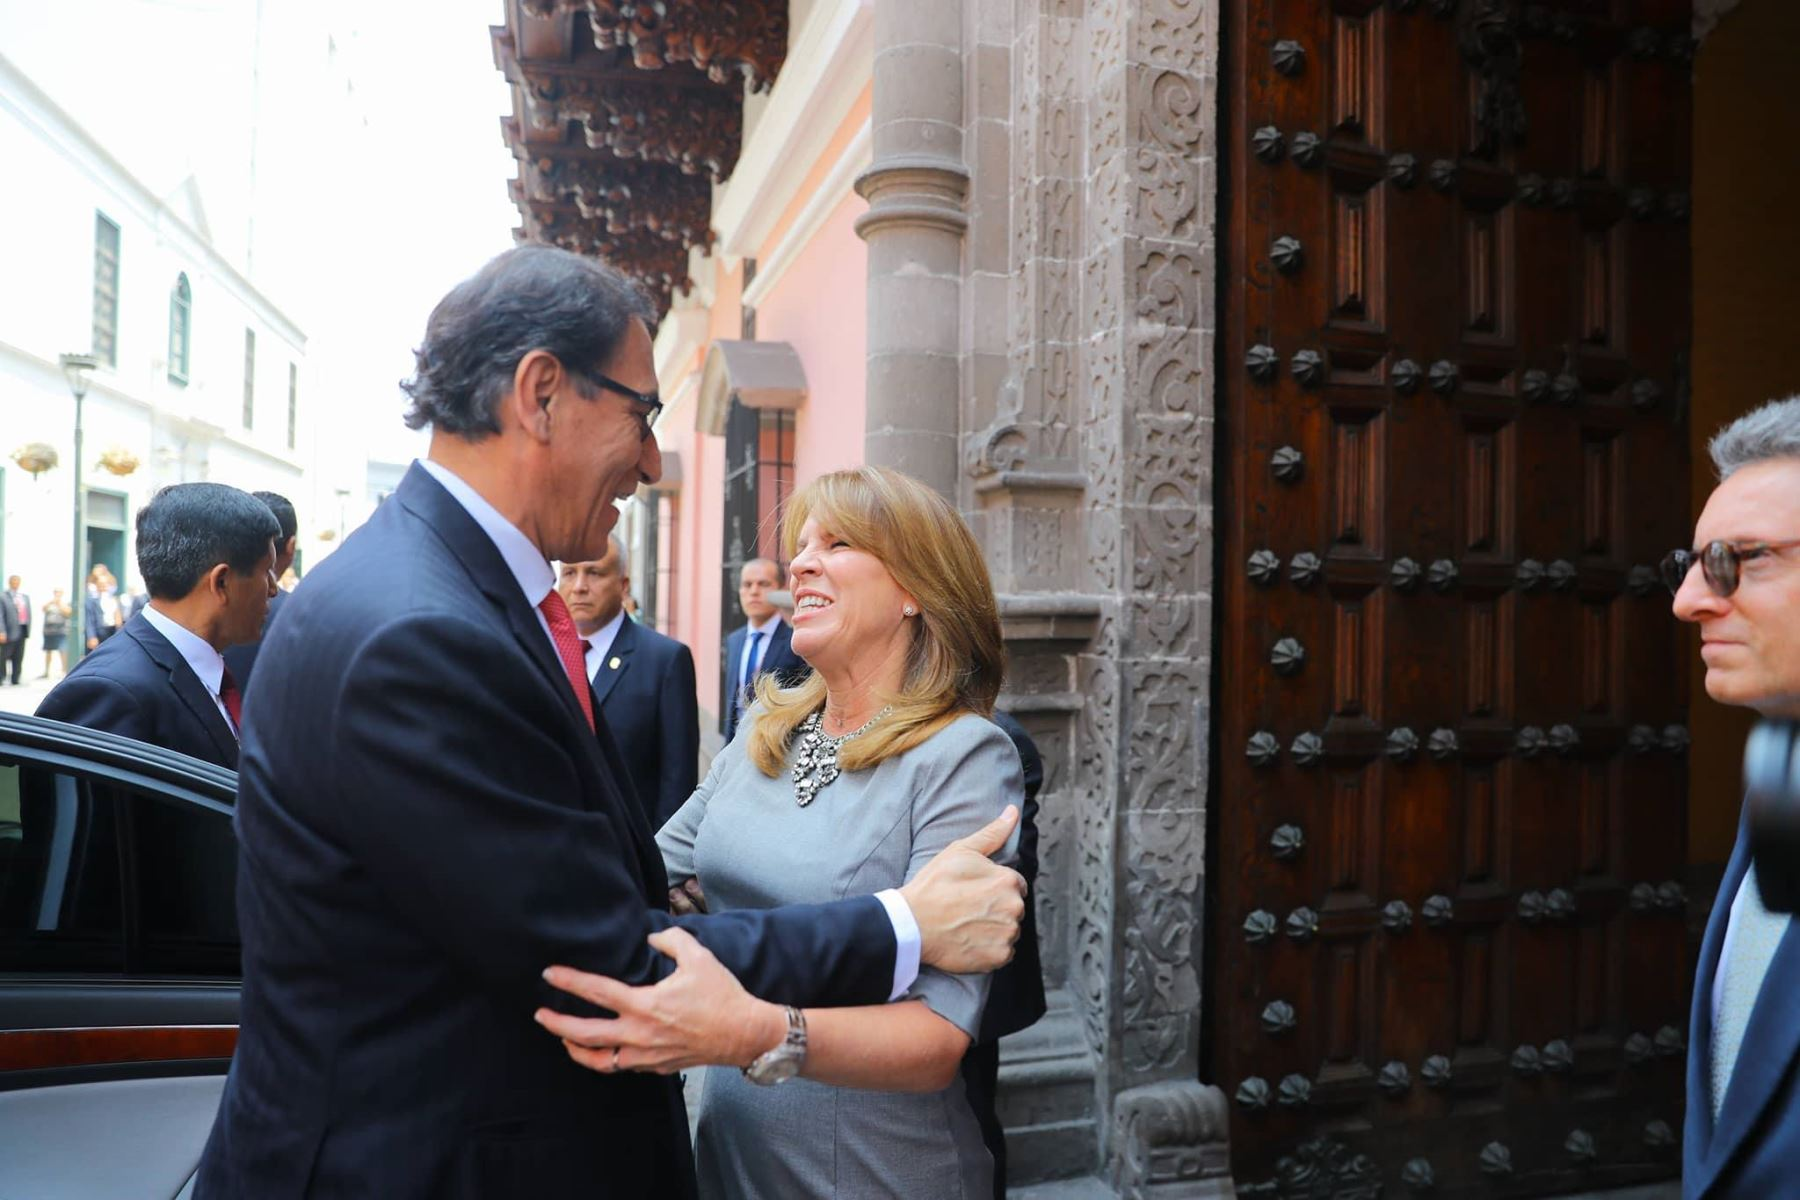 ANDINA/Andrés Valle